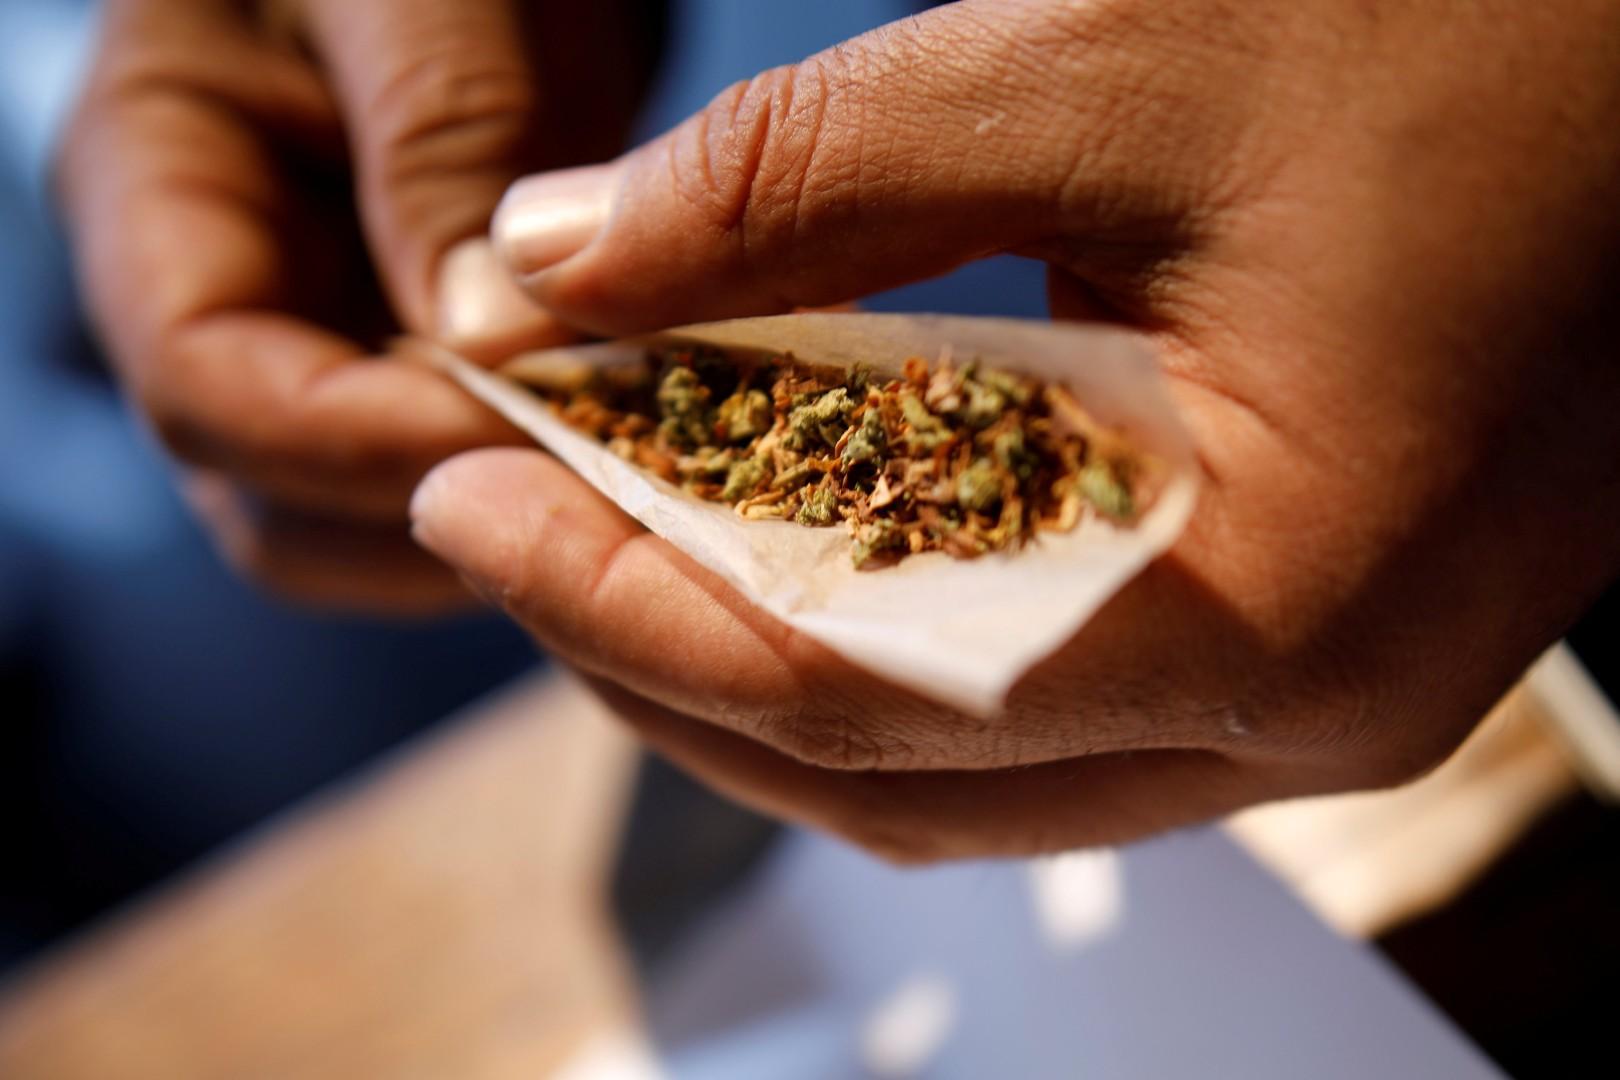 Will Thailand's legal medical marijuana seed a new black market